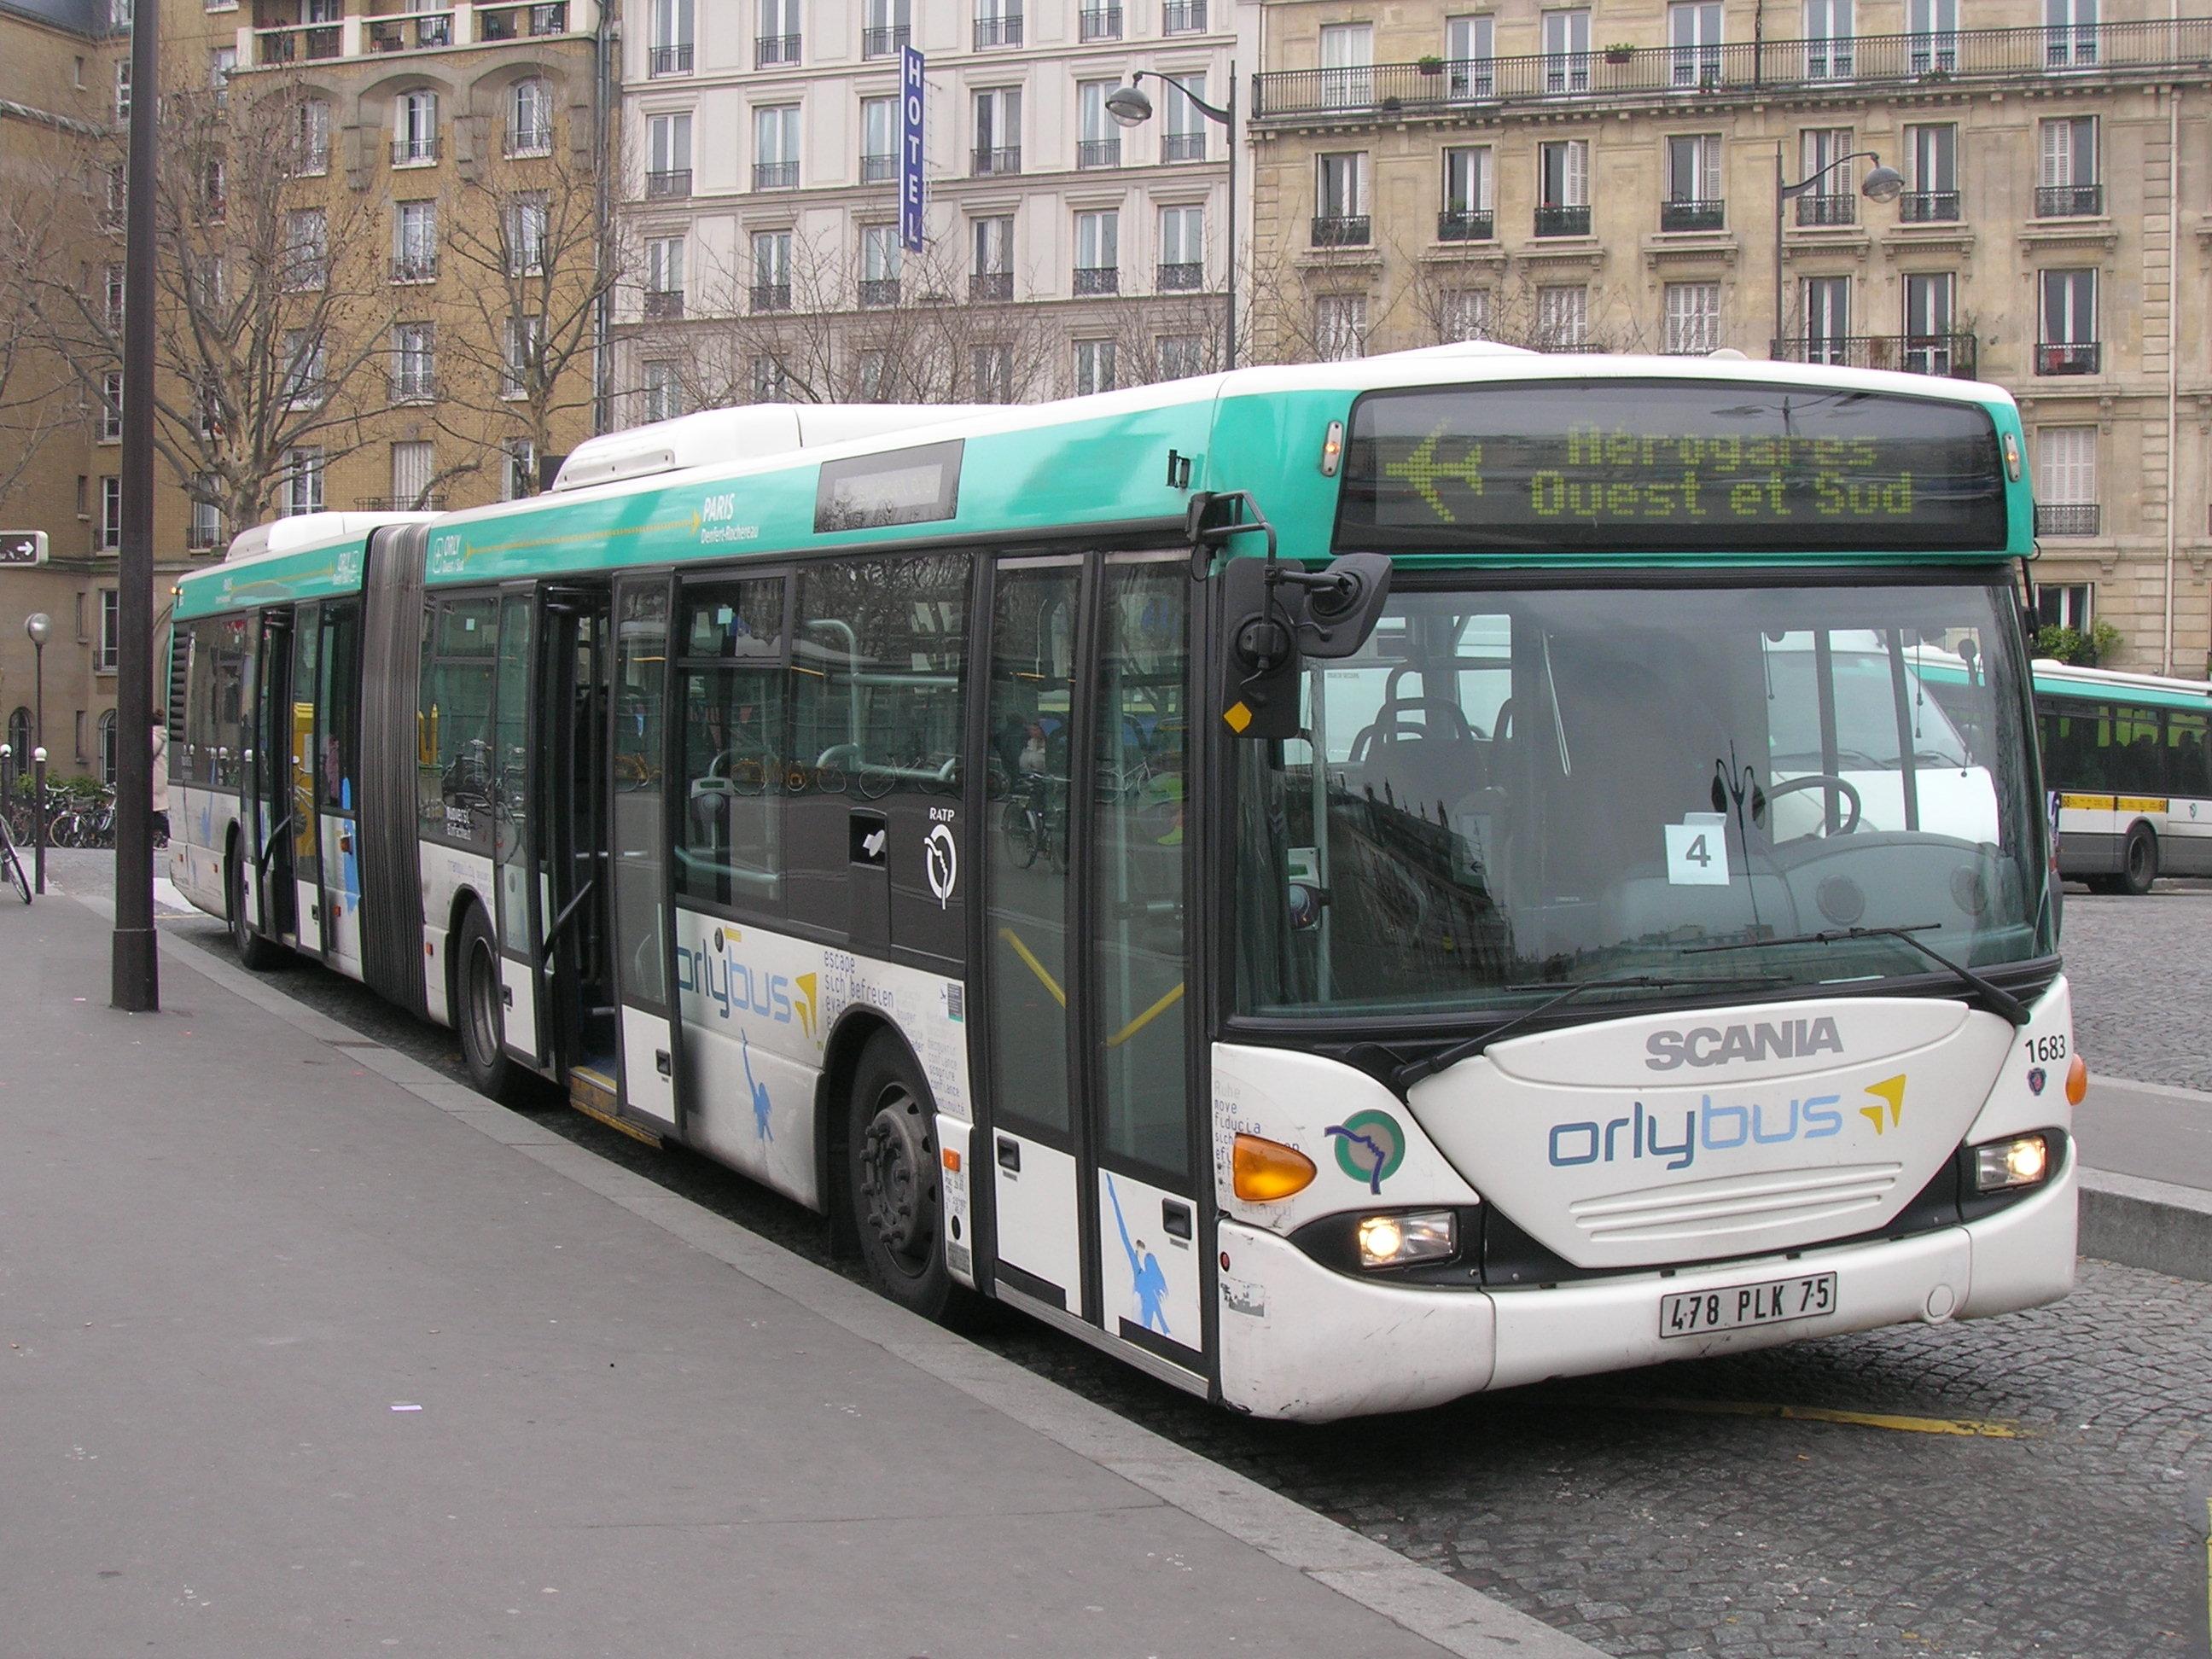 File:RATP Orlybus Denfert-Rochereau.JPG - Wikimedia Commons